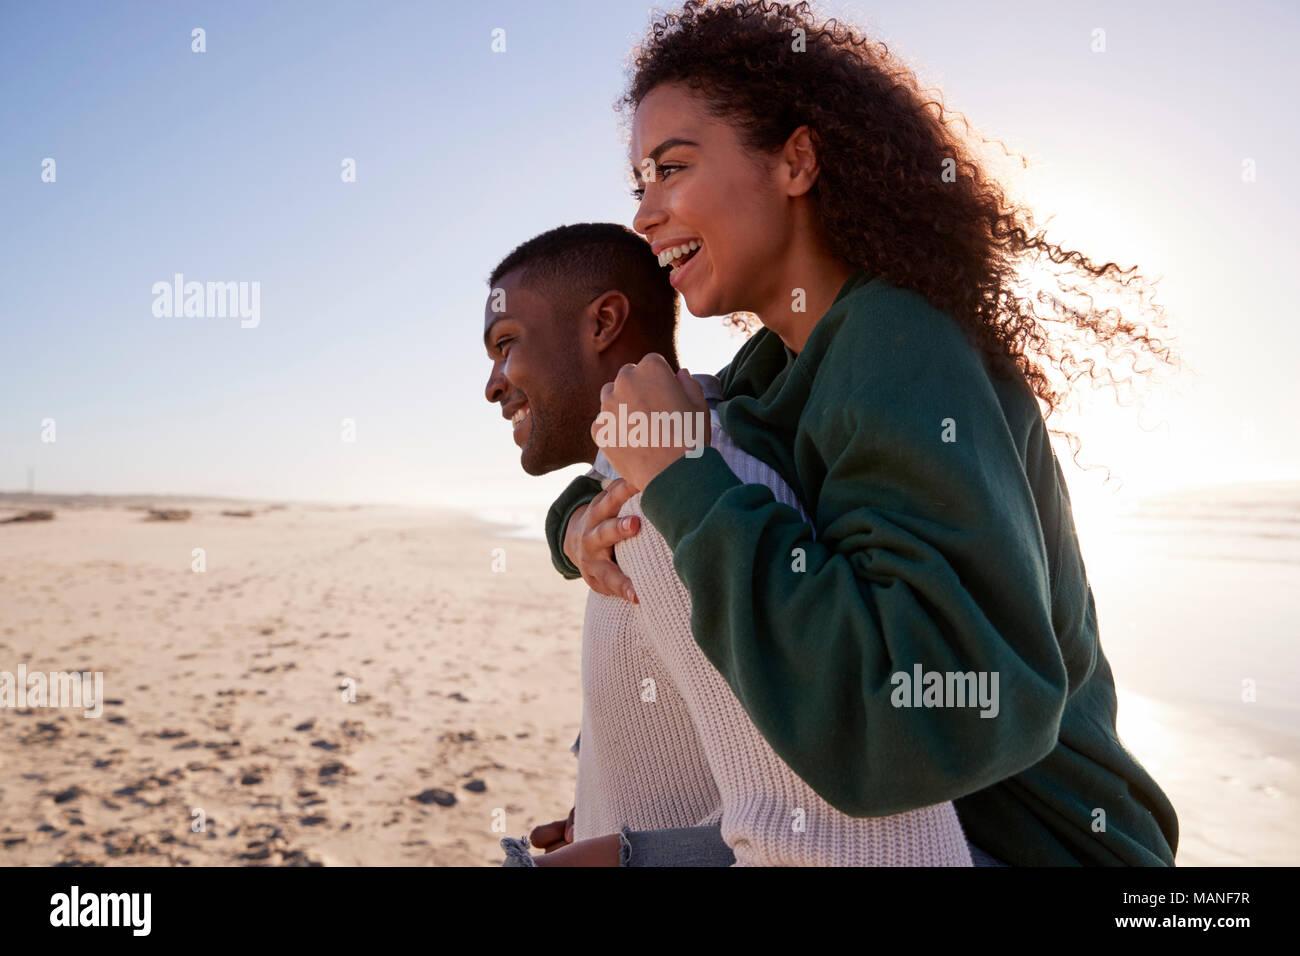 Man Giving Woman Piggyback sur Winter Beach Locations Photo Stock